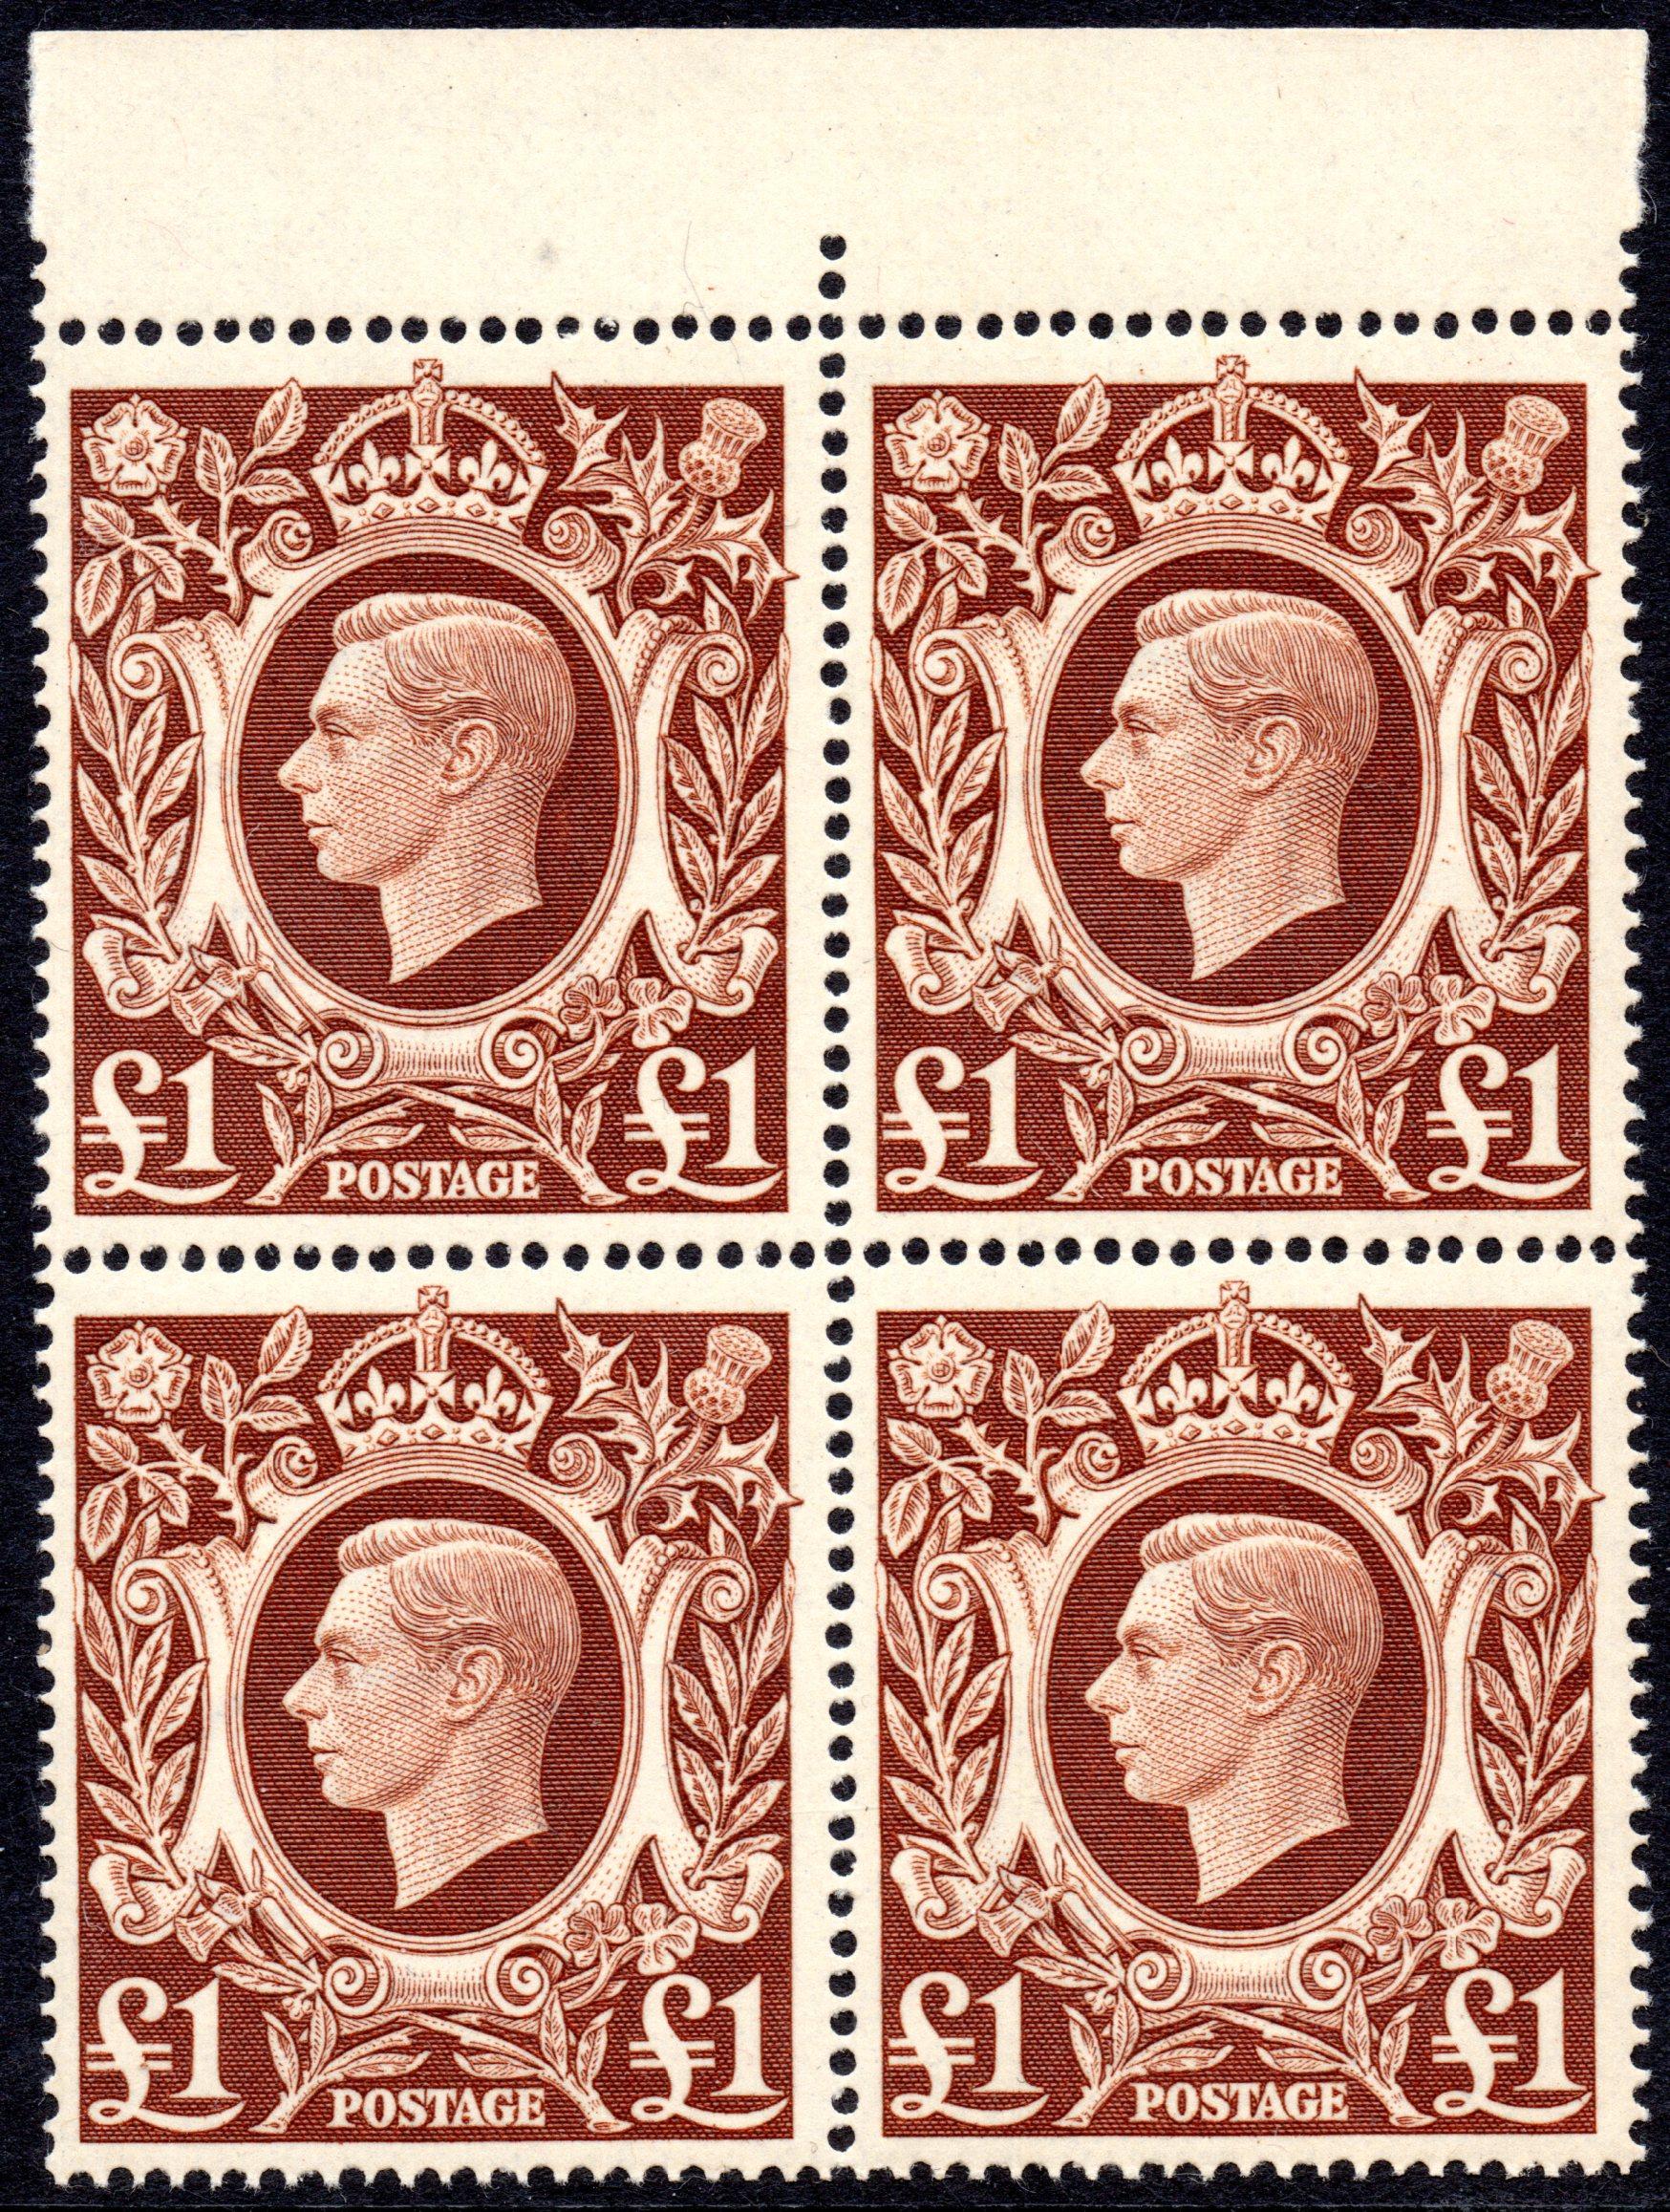 1948 £1 BROWN UMM BLOCK OF FOUR